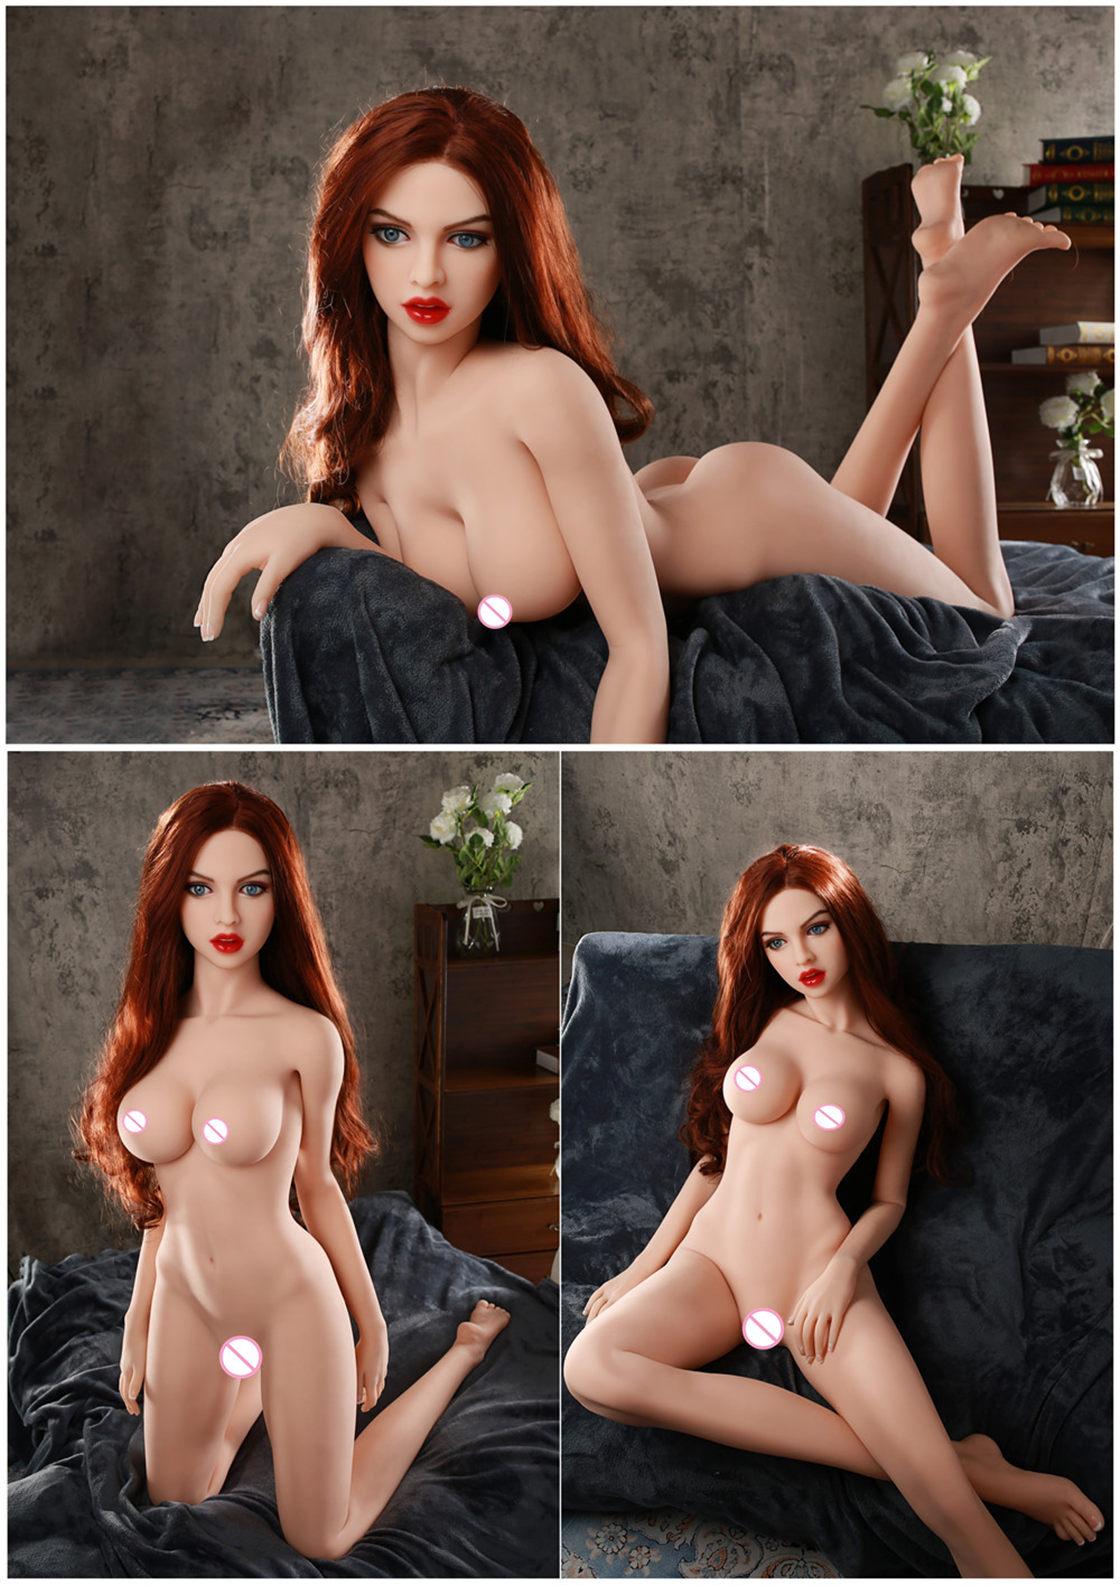 3 intelligent sex doll